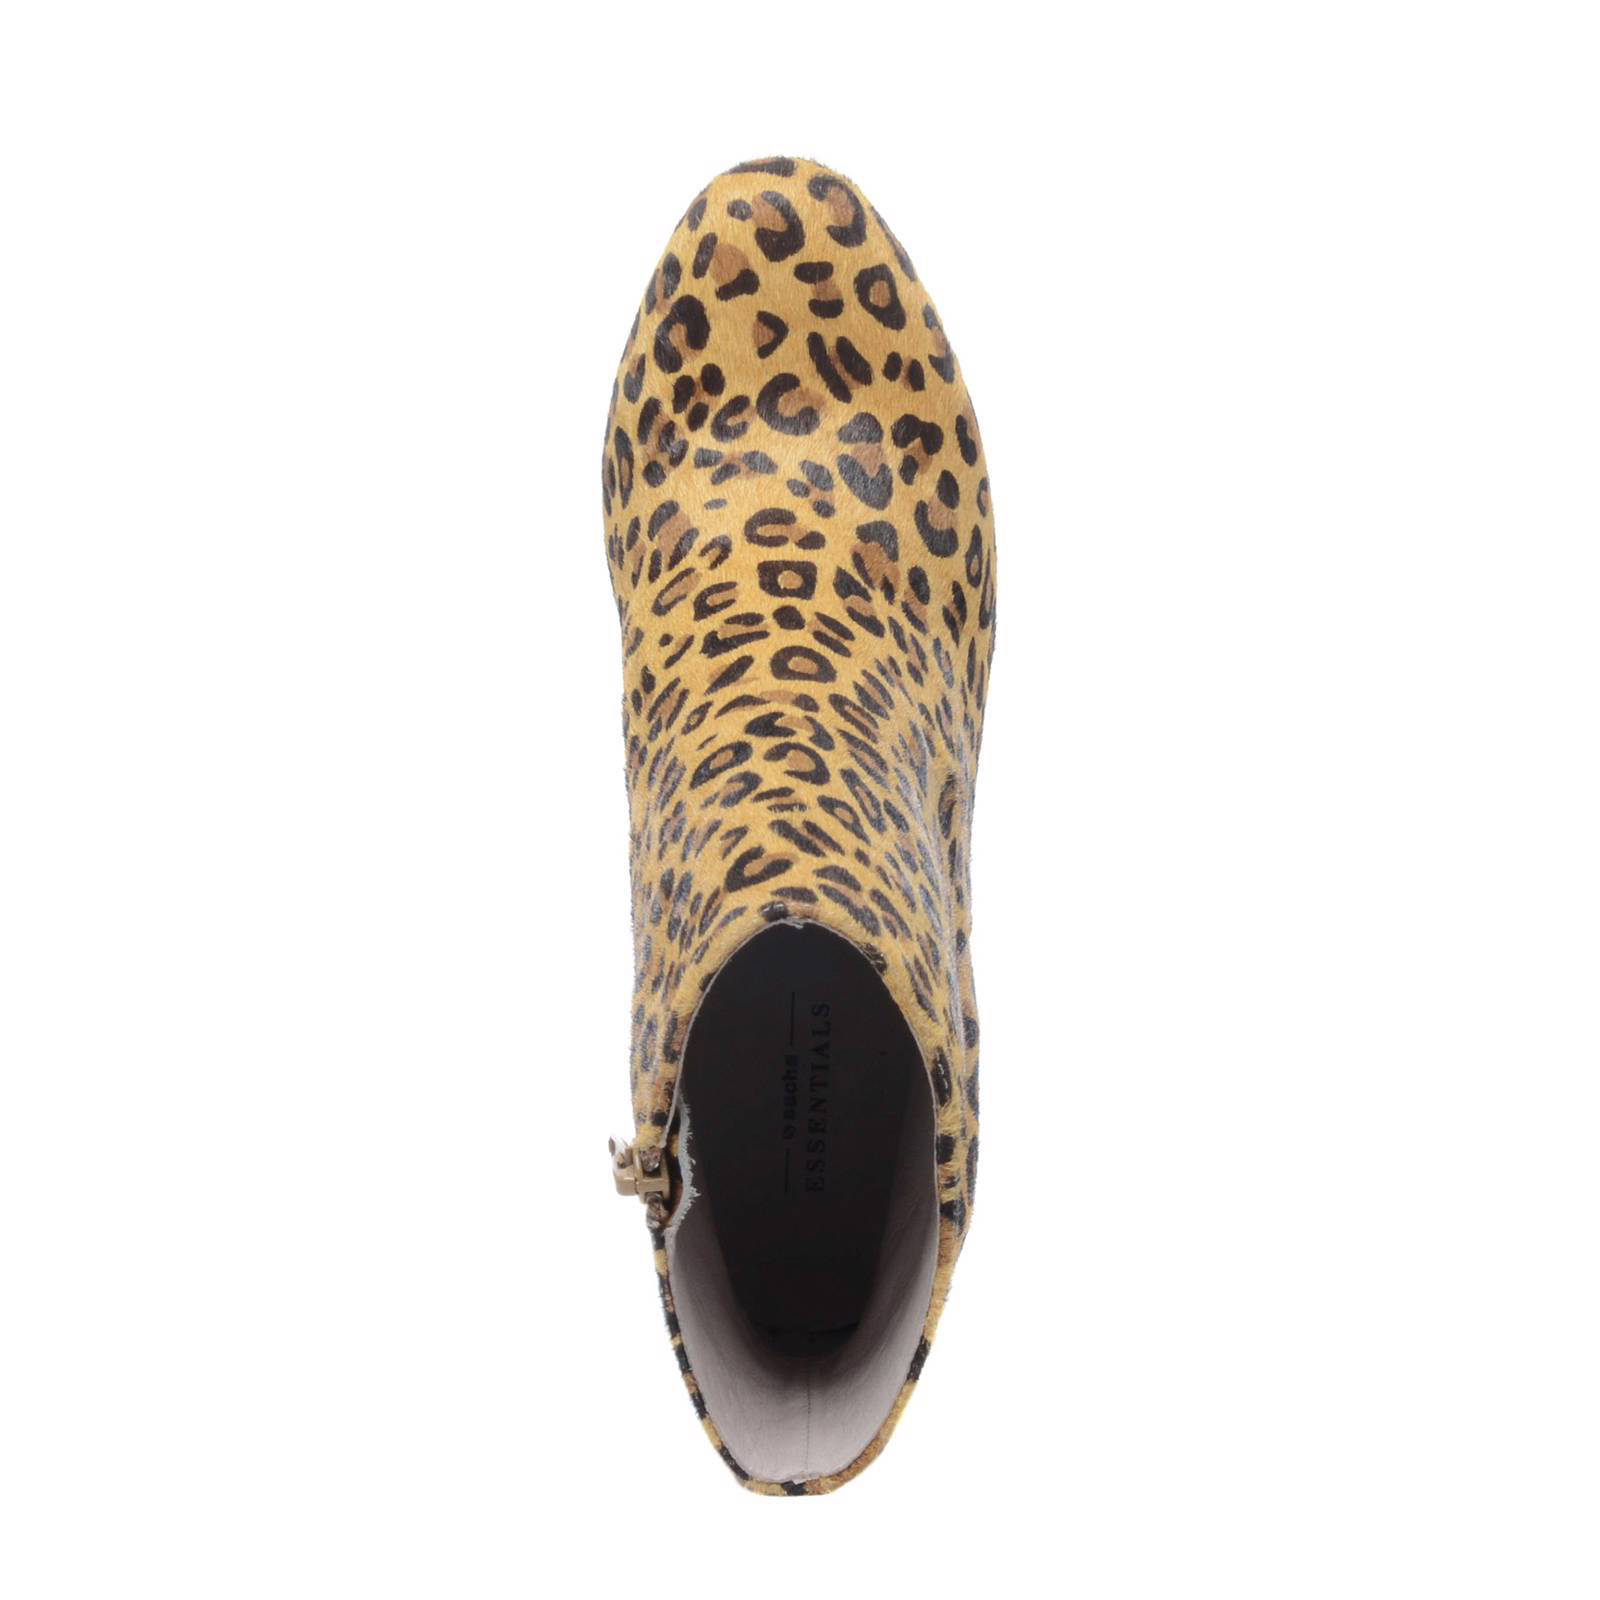 luipaardenprints enkellaarsjes